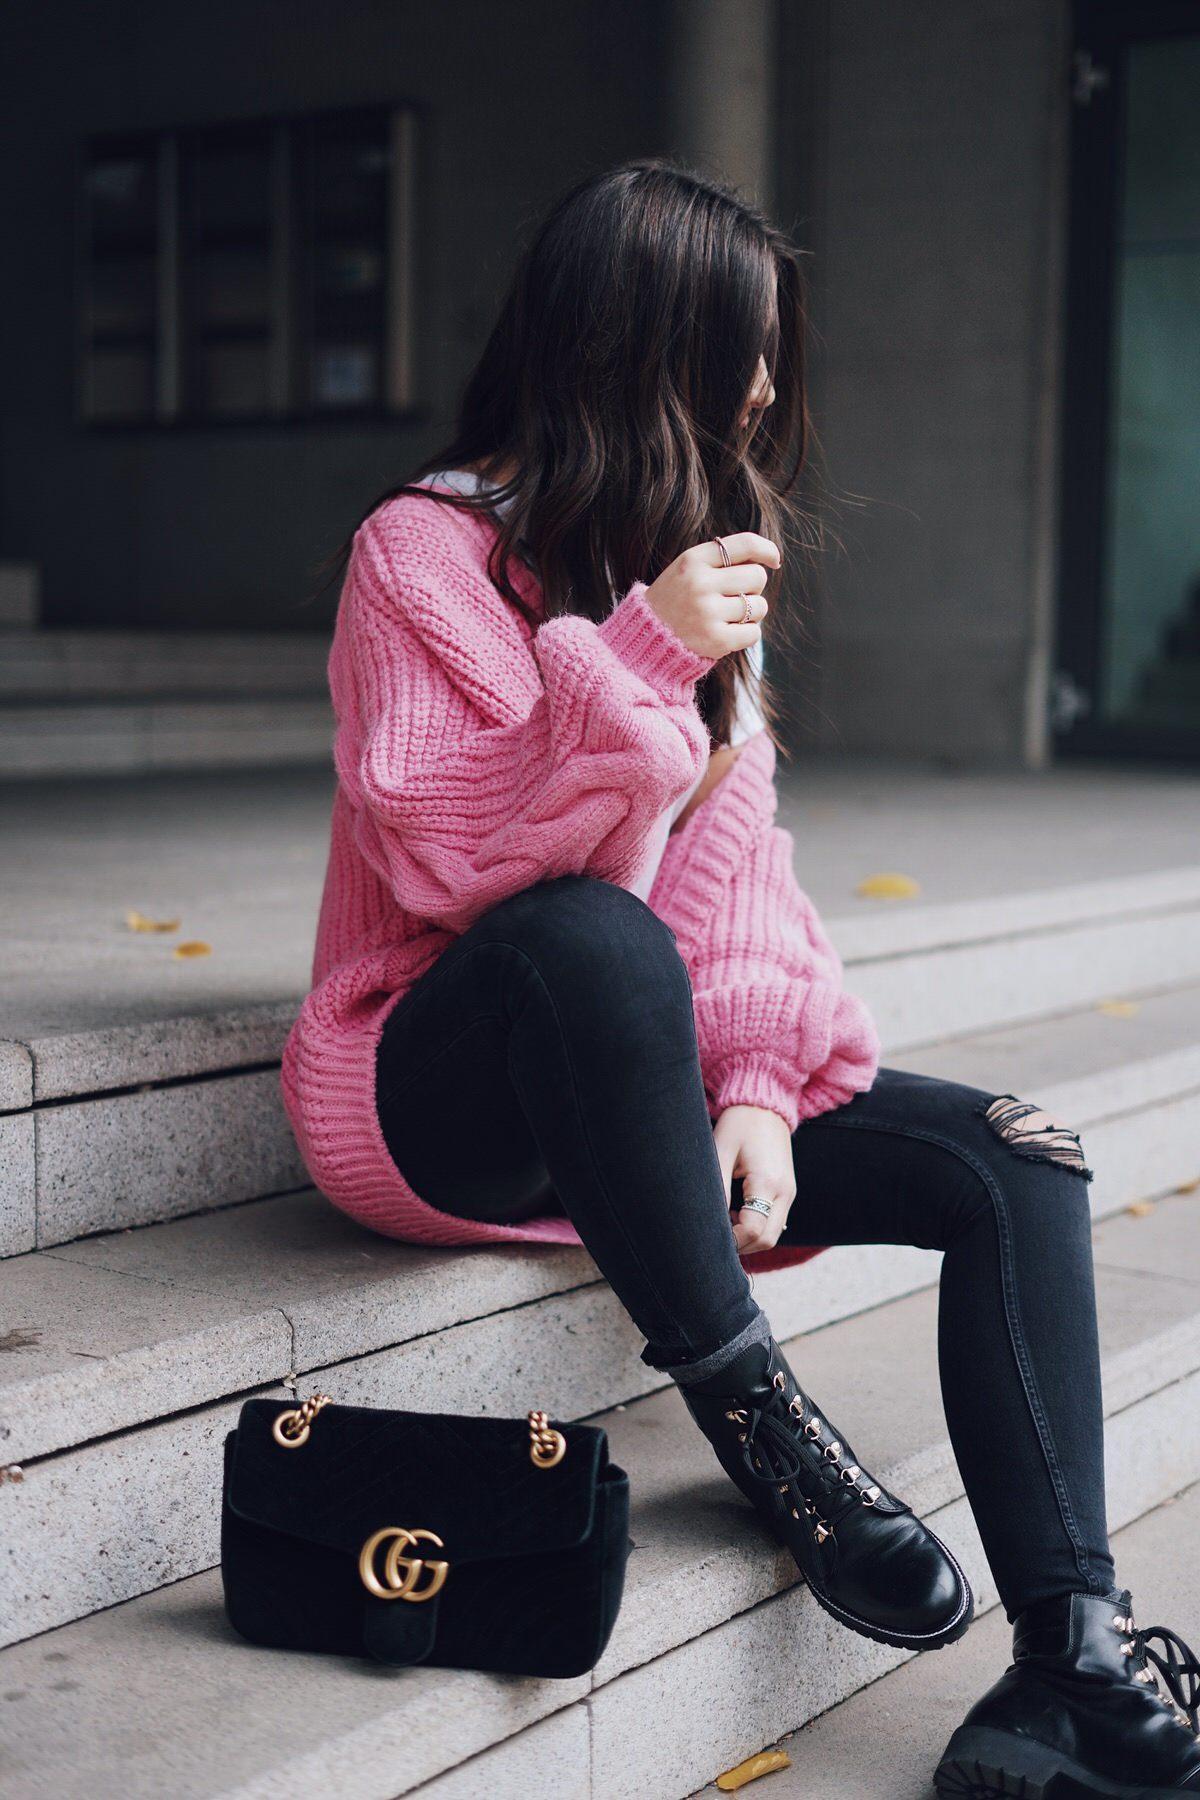 Streetstyle, Gucci Mamont Velvet Samt, Kurt Geiger Boots, Knit, Zara, Fashion, Blogger